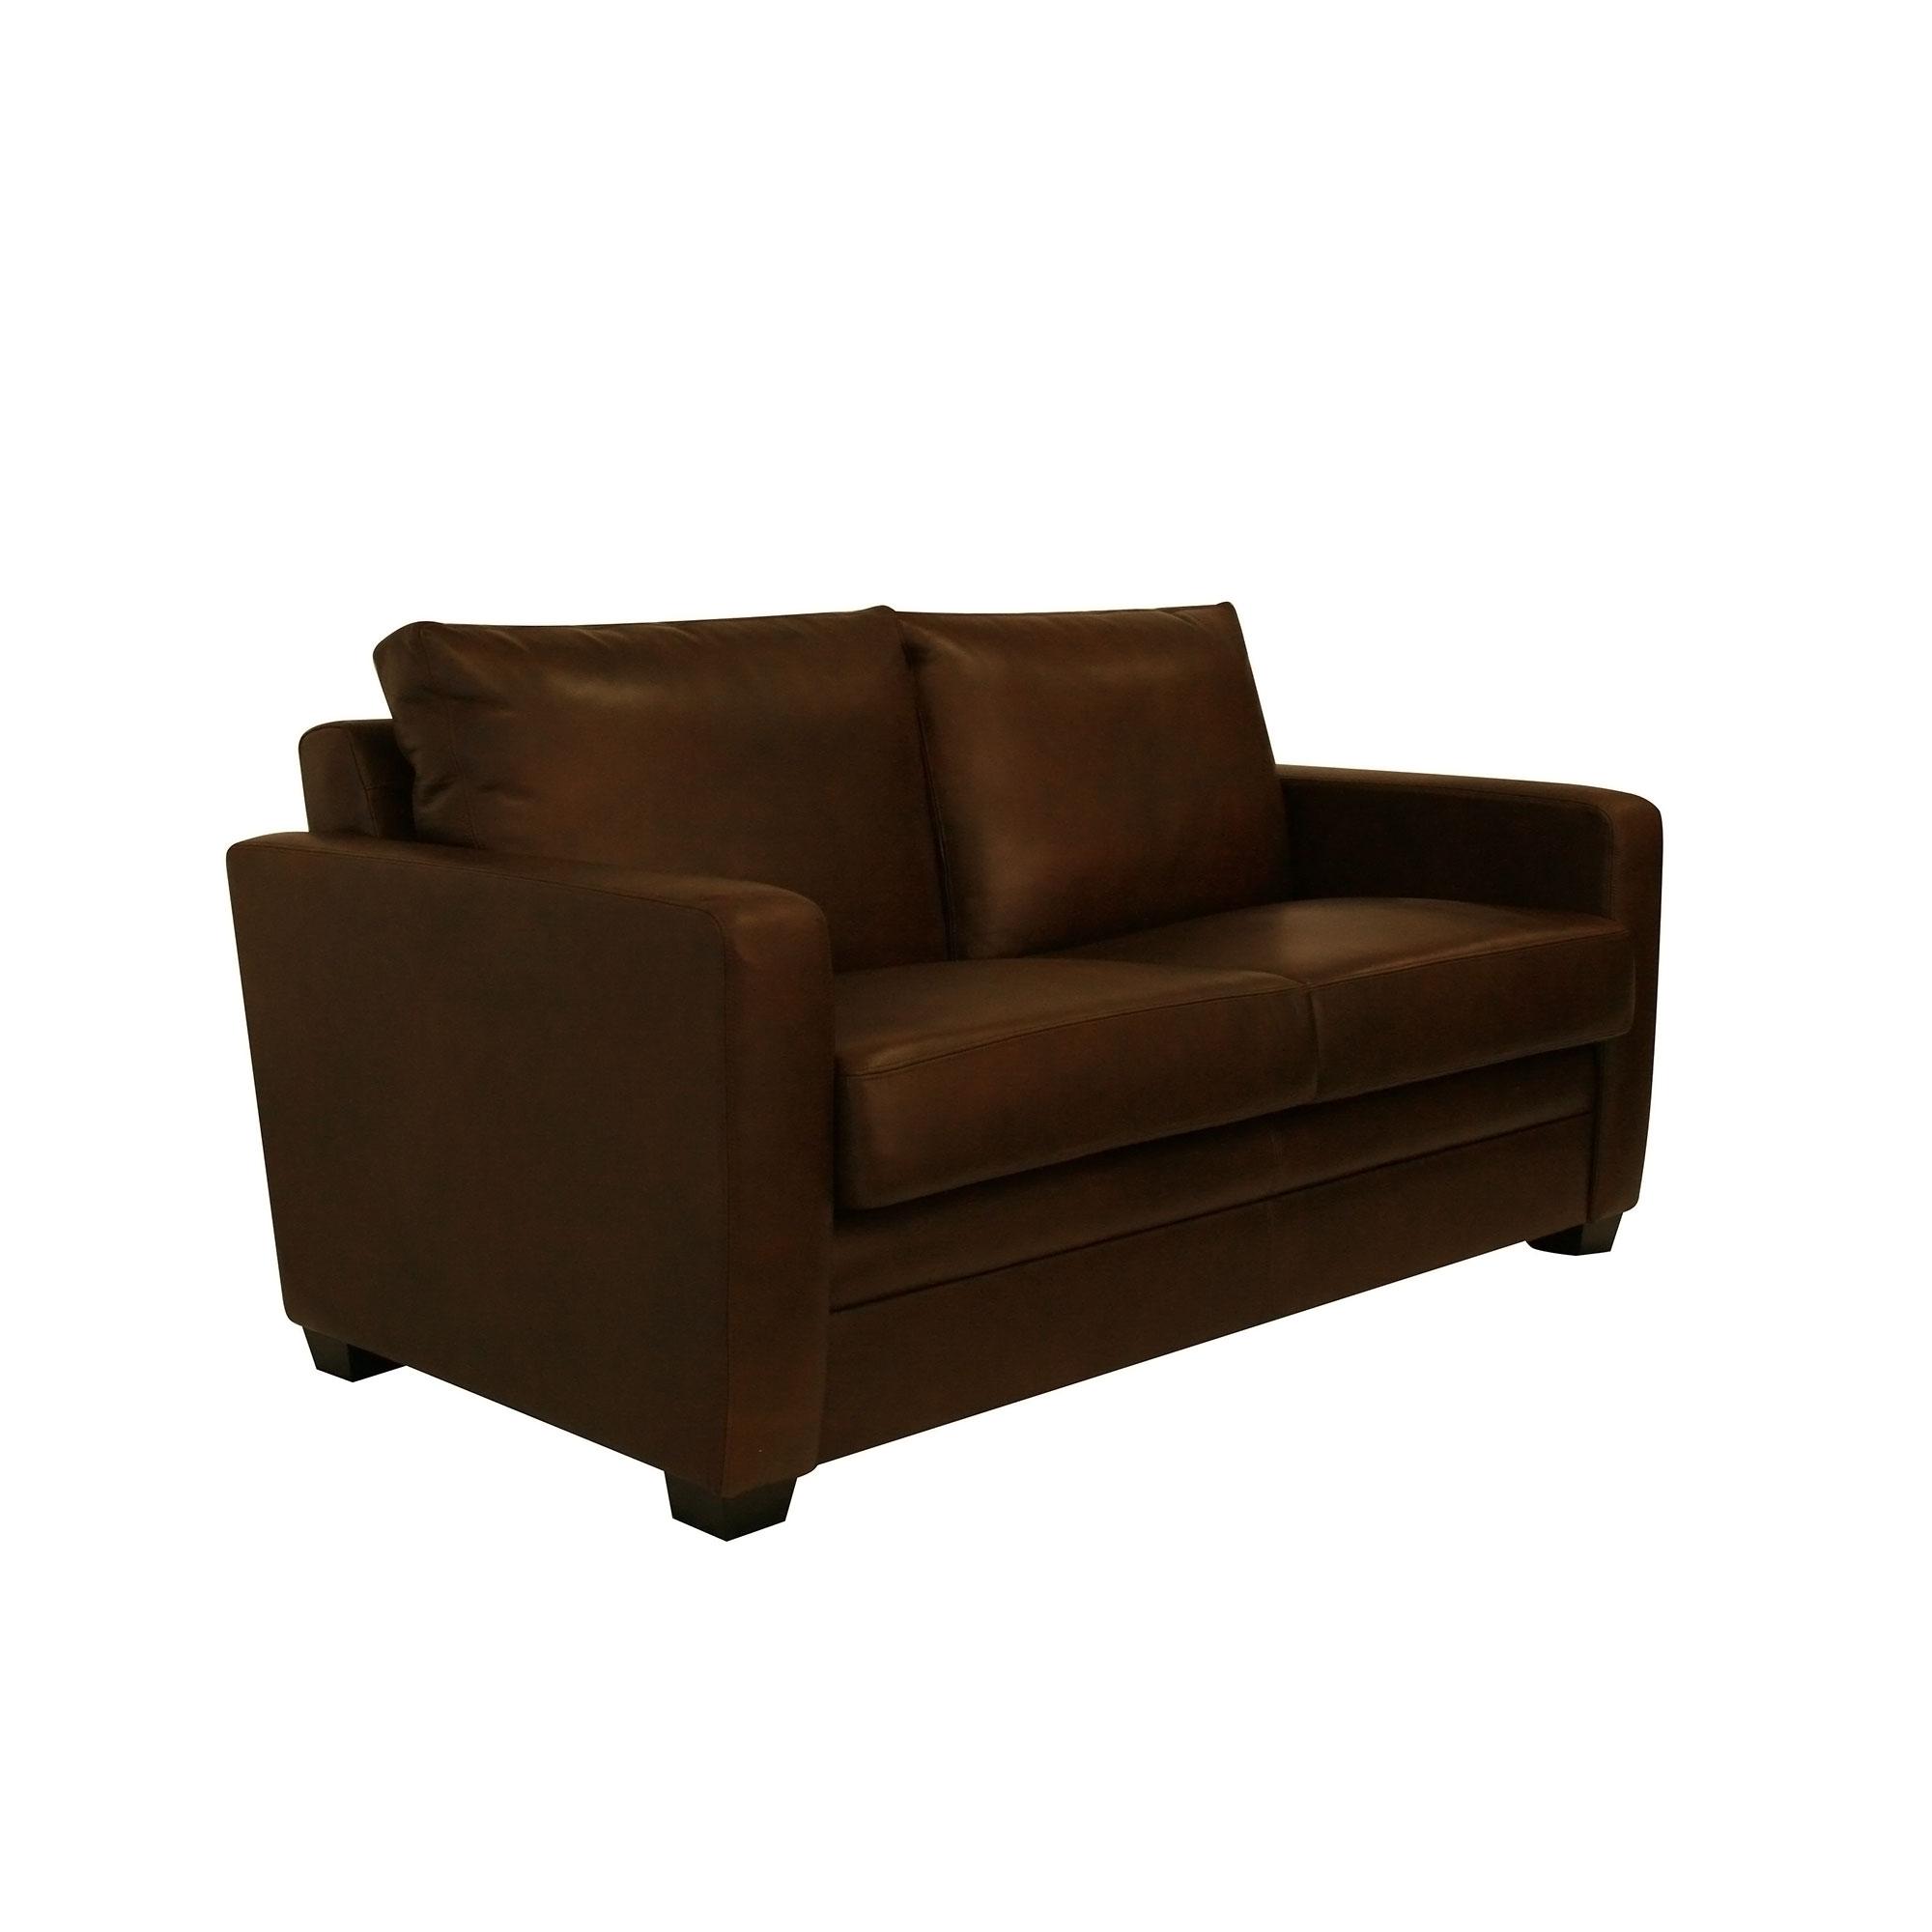 Corina Sofa  sc 1 st  Moran Furniture & Sofas - Moran Furniture islam-shia.org